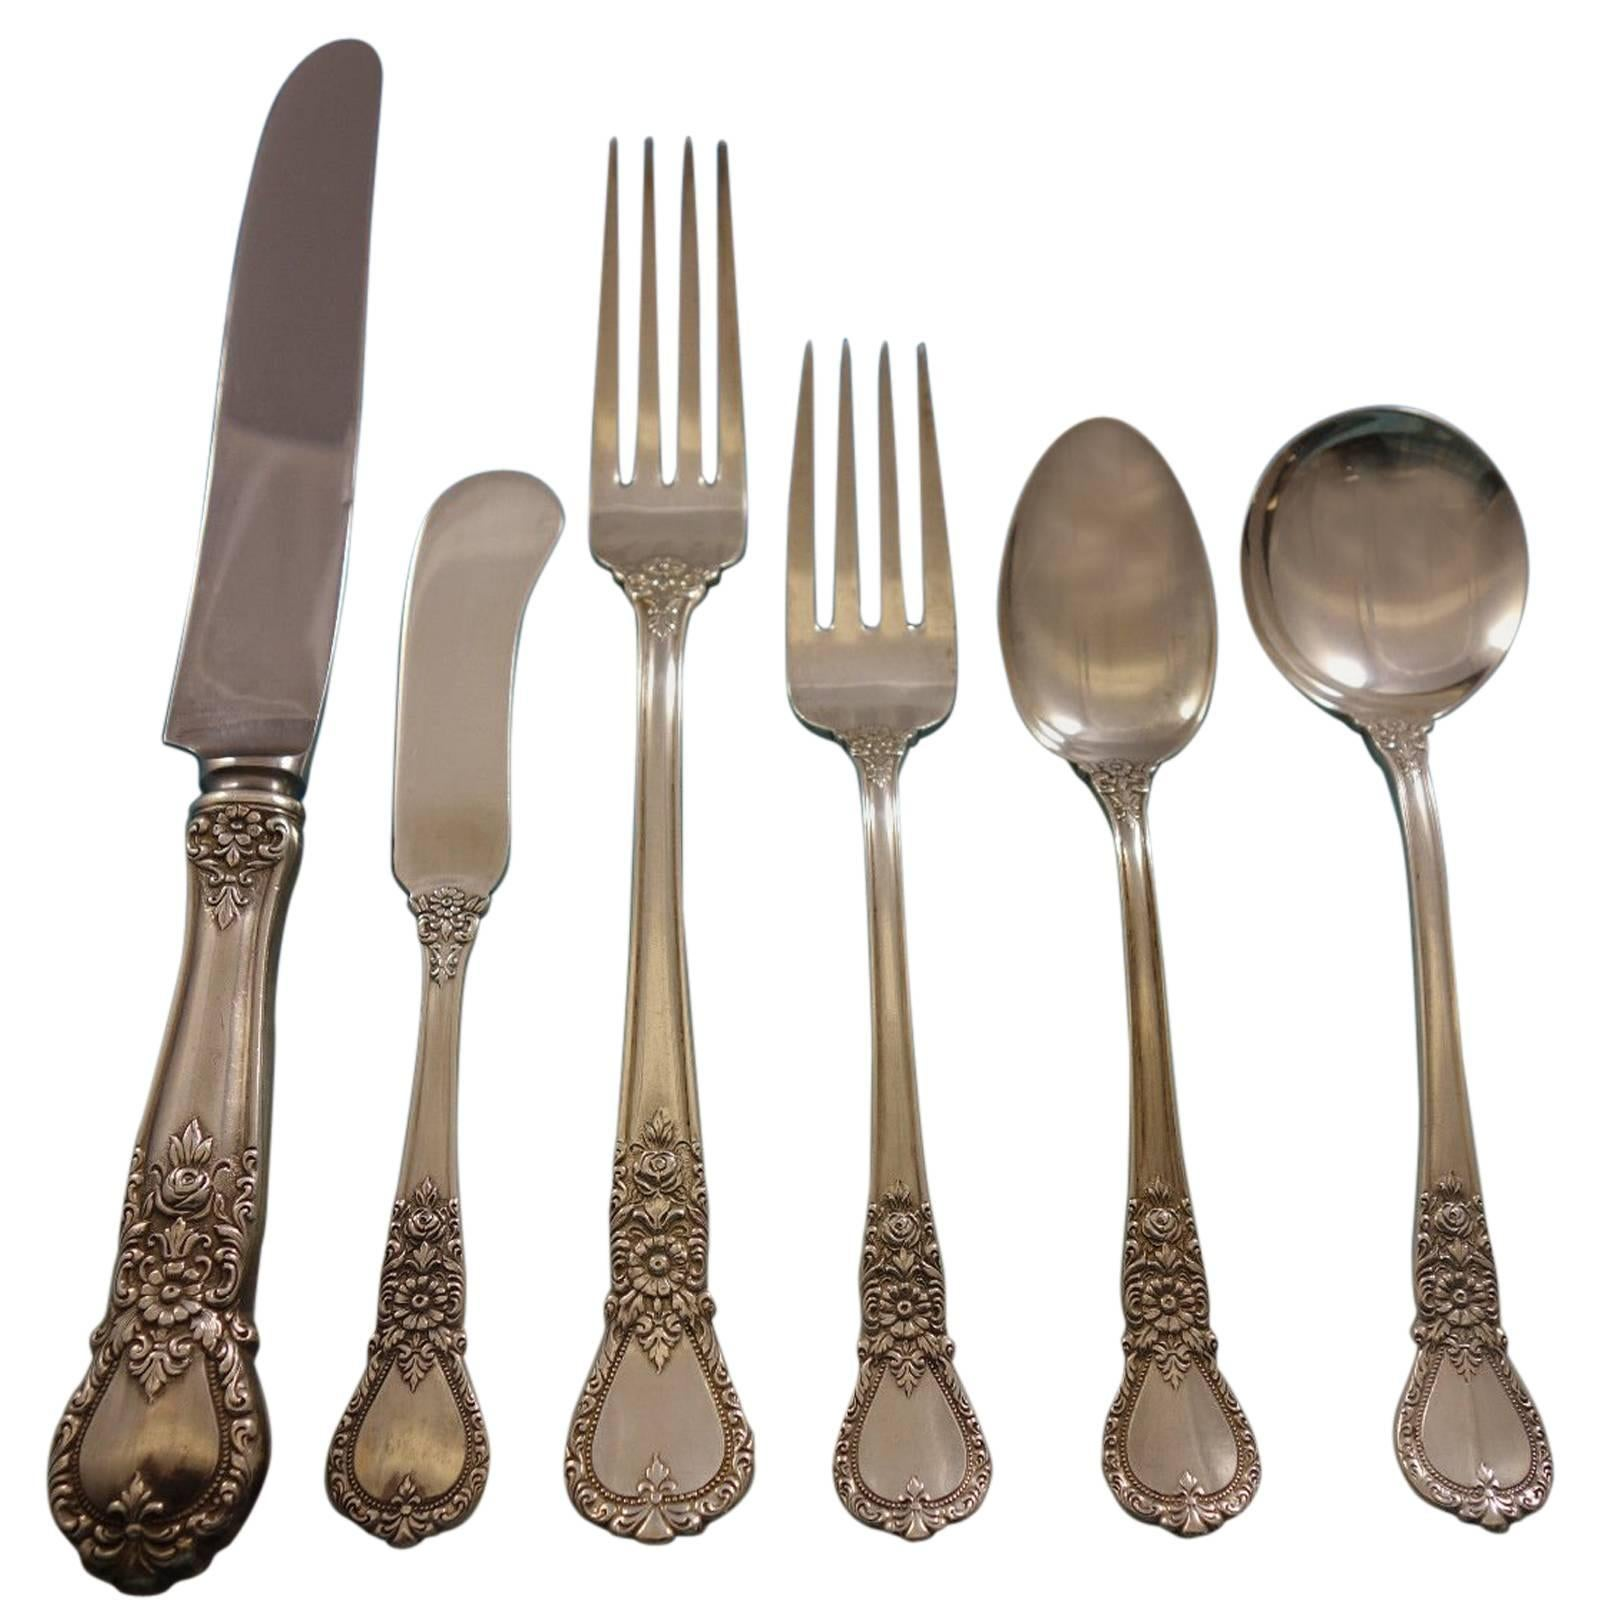 Ballet, Weidlich Sterling Silver Flatware Set for Eight Service 48 Pieces Dinner